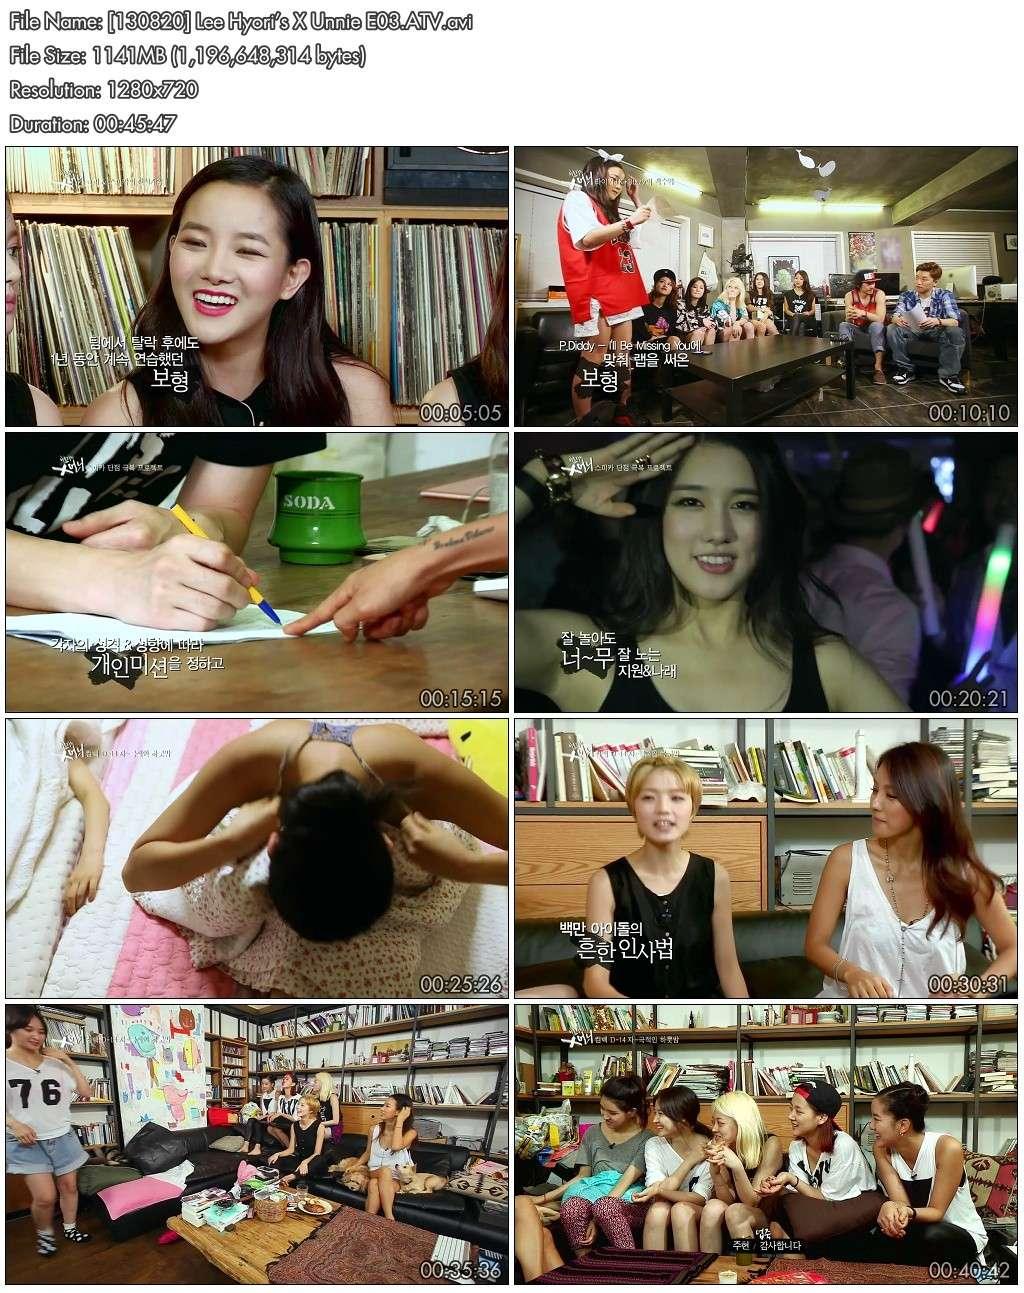 [DL][08.2013] Lee Hyori's X Unnie Ep.04 13082011